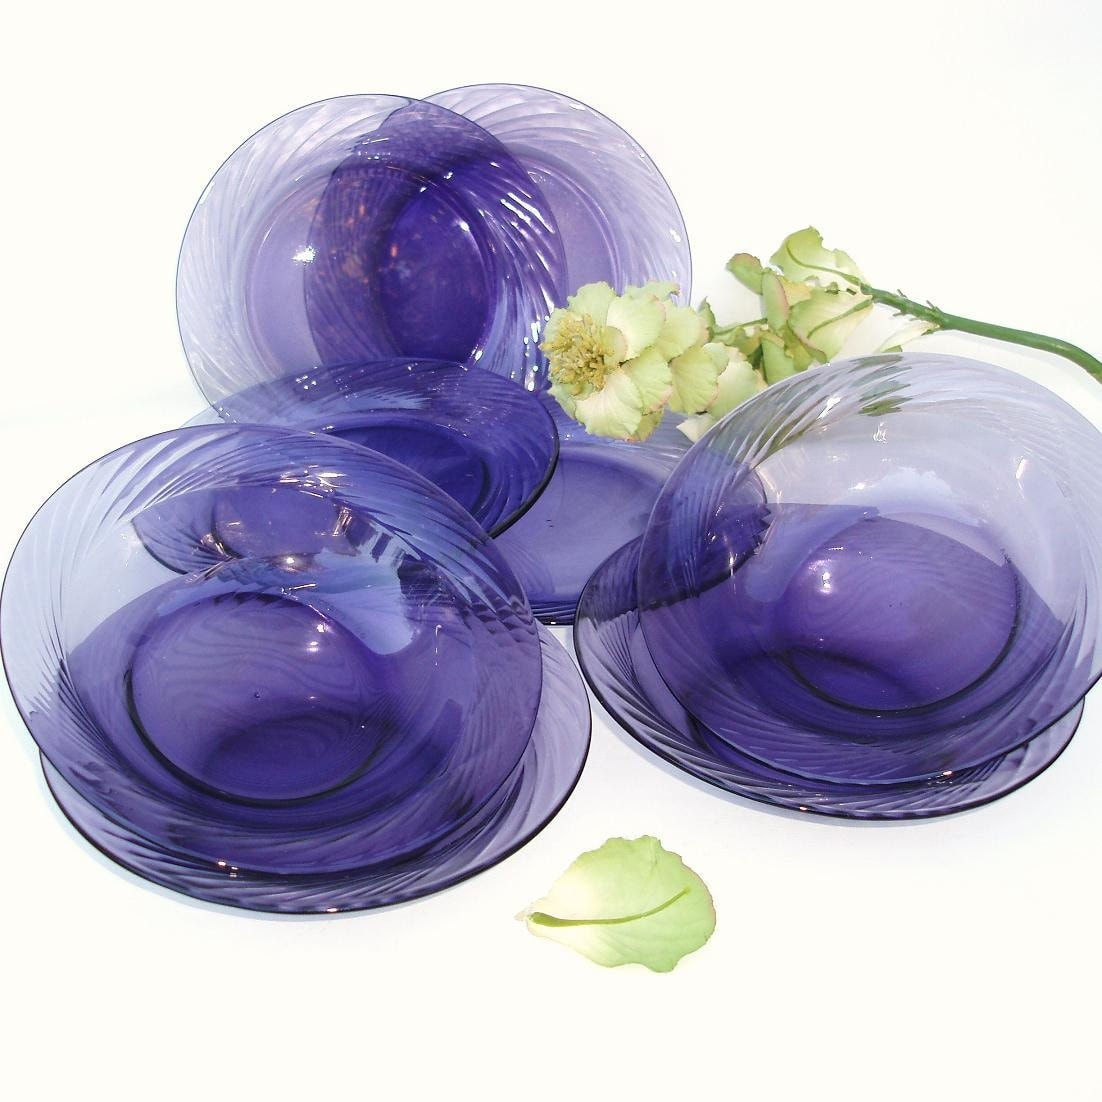 Vintage Purple Pyrex Dishes Amethyst Glassware Glass Plates